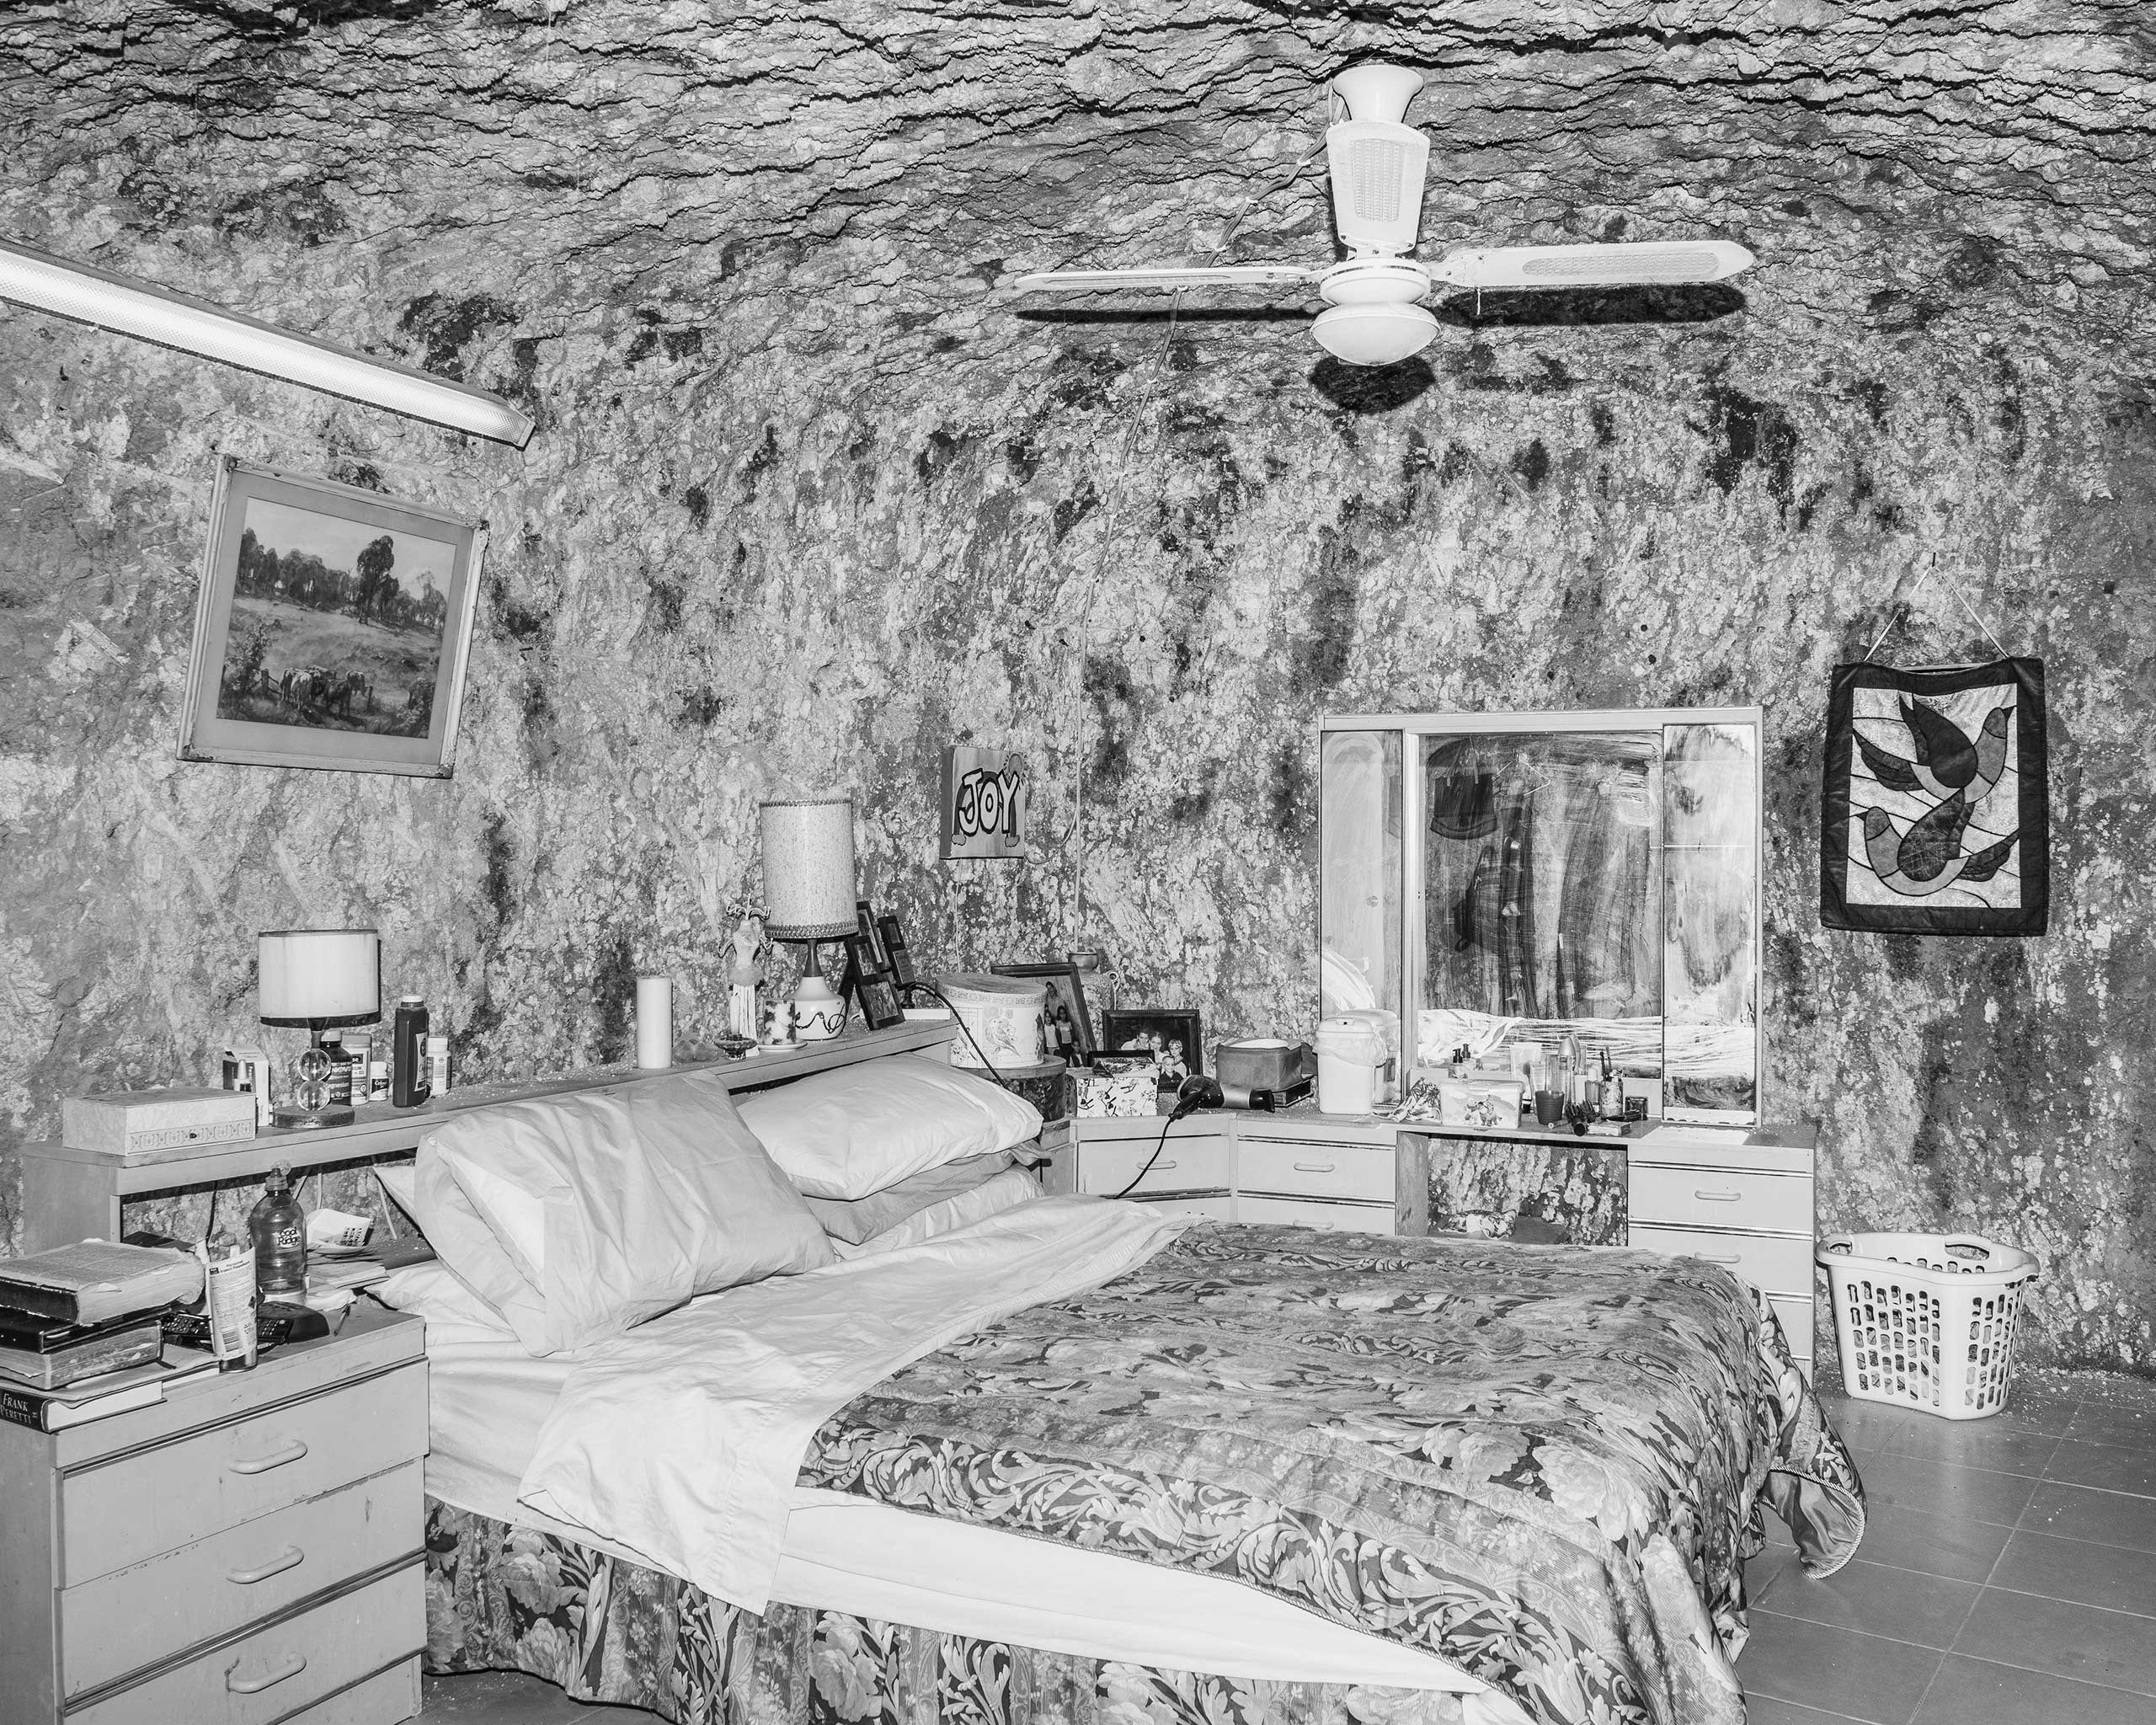 George and Suzy's Bedroom, Coober Pedy, Australia, 2016.